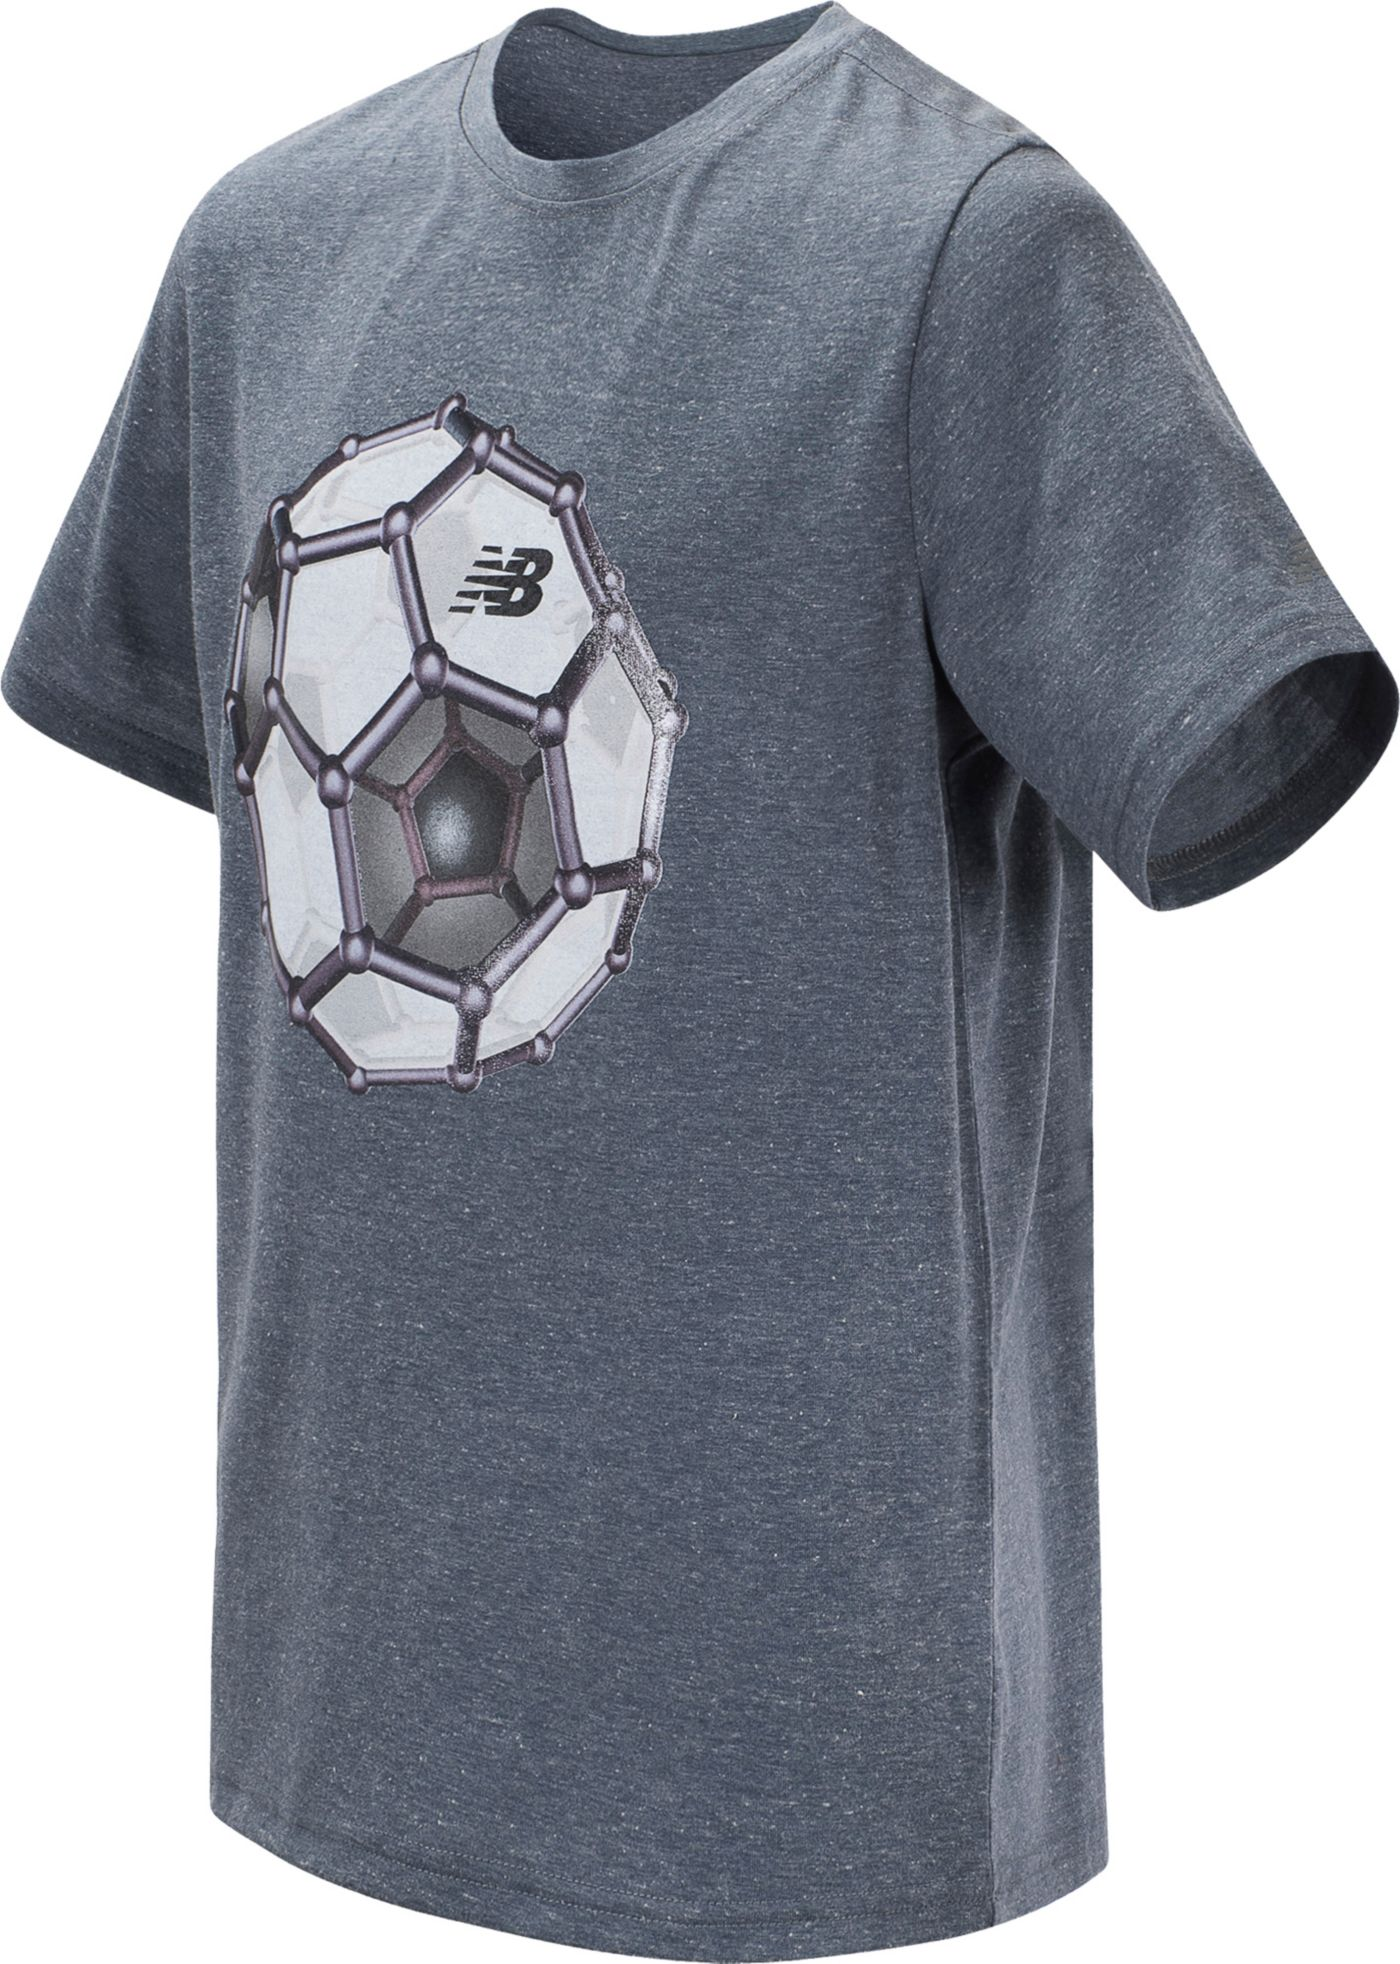 New Balance Boy's Soccer T-Shirt